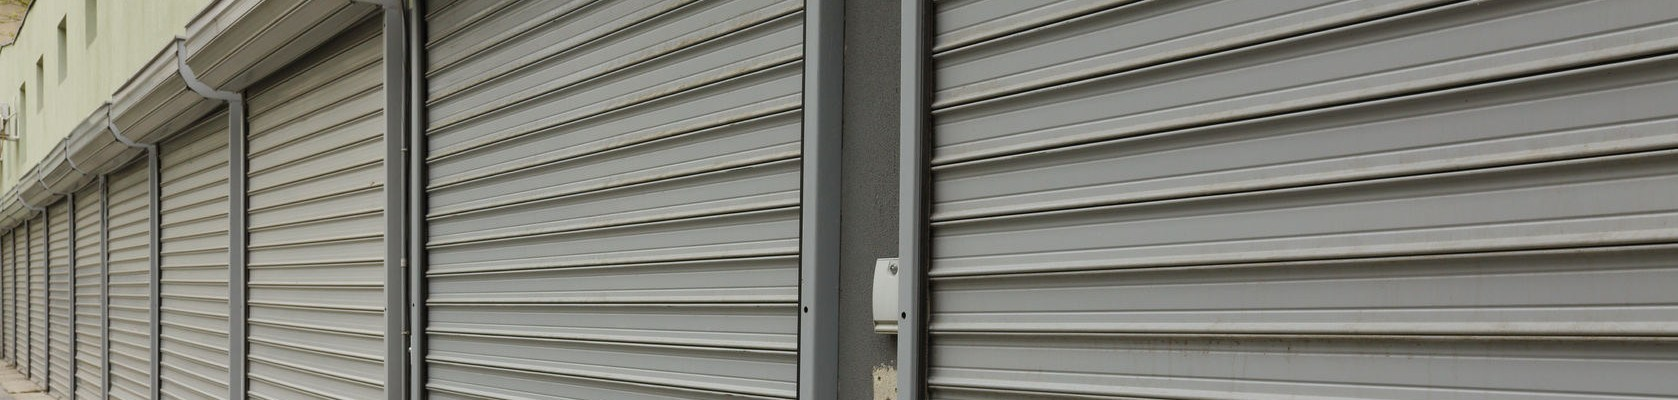 persianas metalicas horizontal - Instalacion Persianas Barcelona